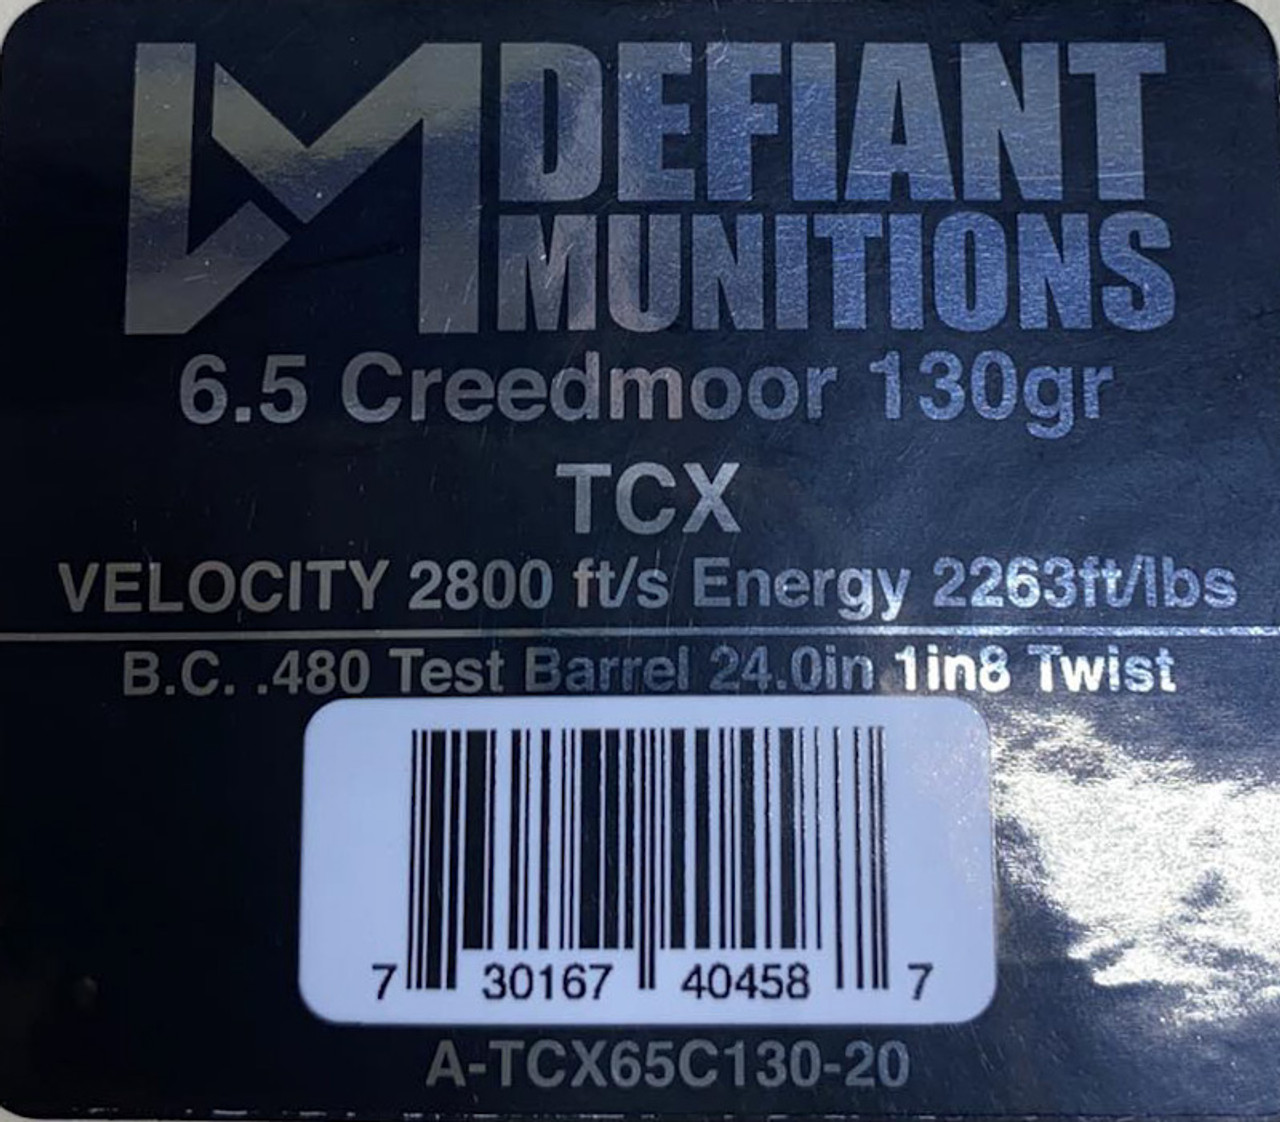 6.5 Creedmoor 130gr TCX (Total Copper X-panding) Solid Copper Defensive Ammunition